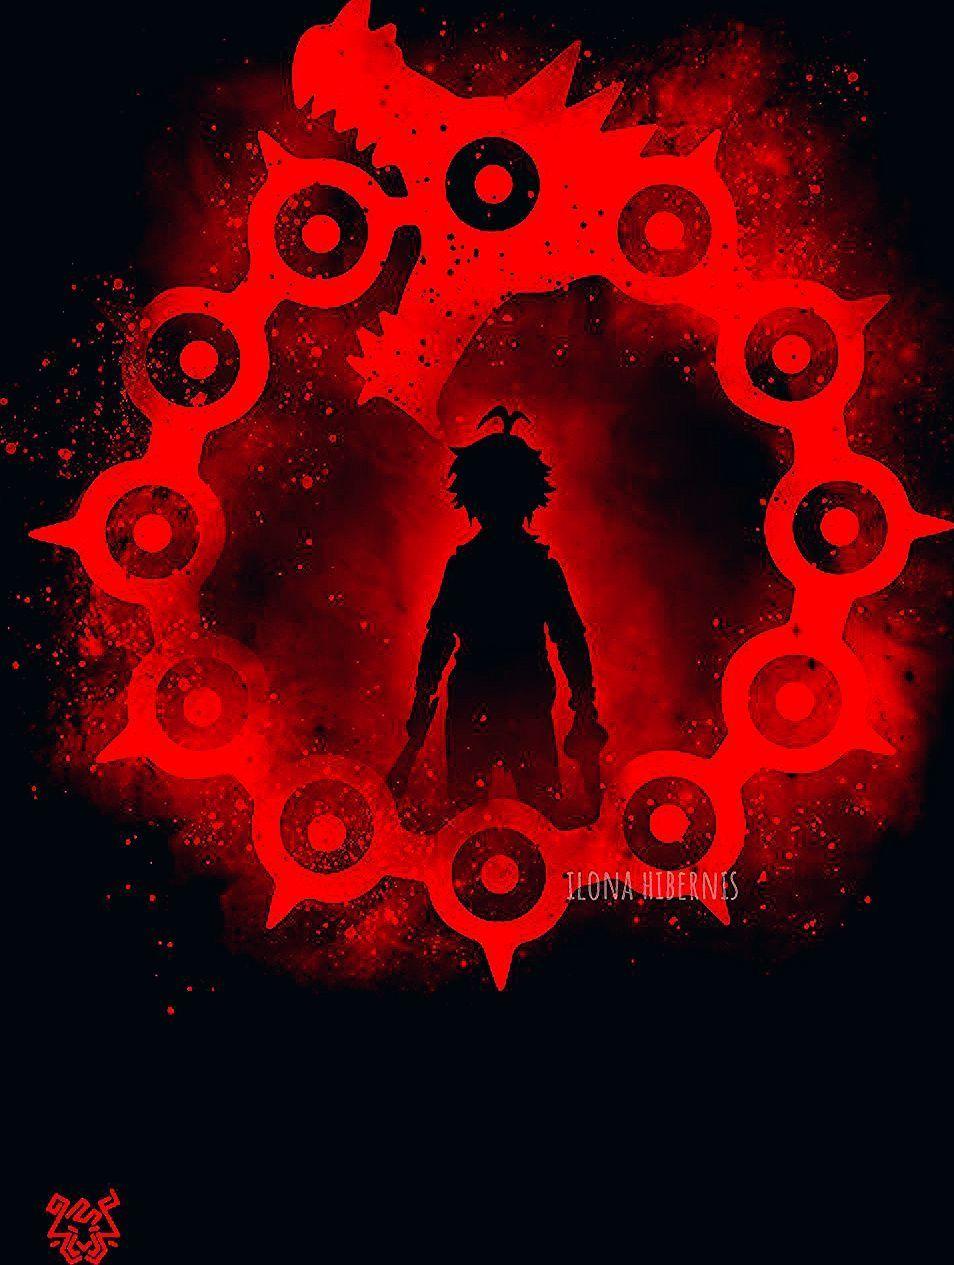 Design Inspired By The Seven Deadly Sins Sin Ilona Hibernis Dragon Wrath Power Anime Manga Sym Anime Wallpaper Seven Deadly Sins Anime Demon King Anime